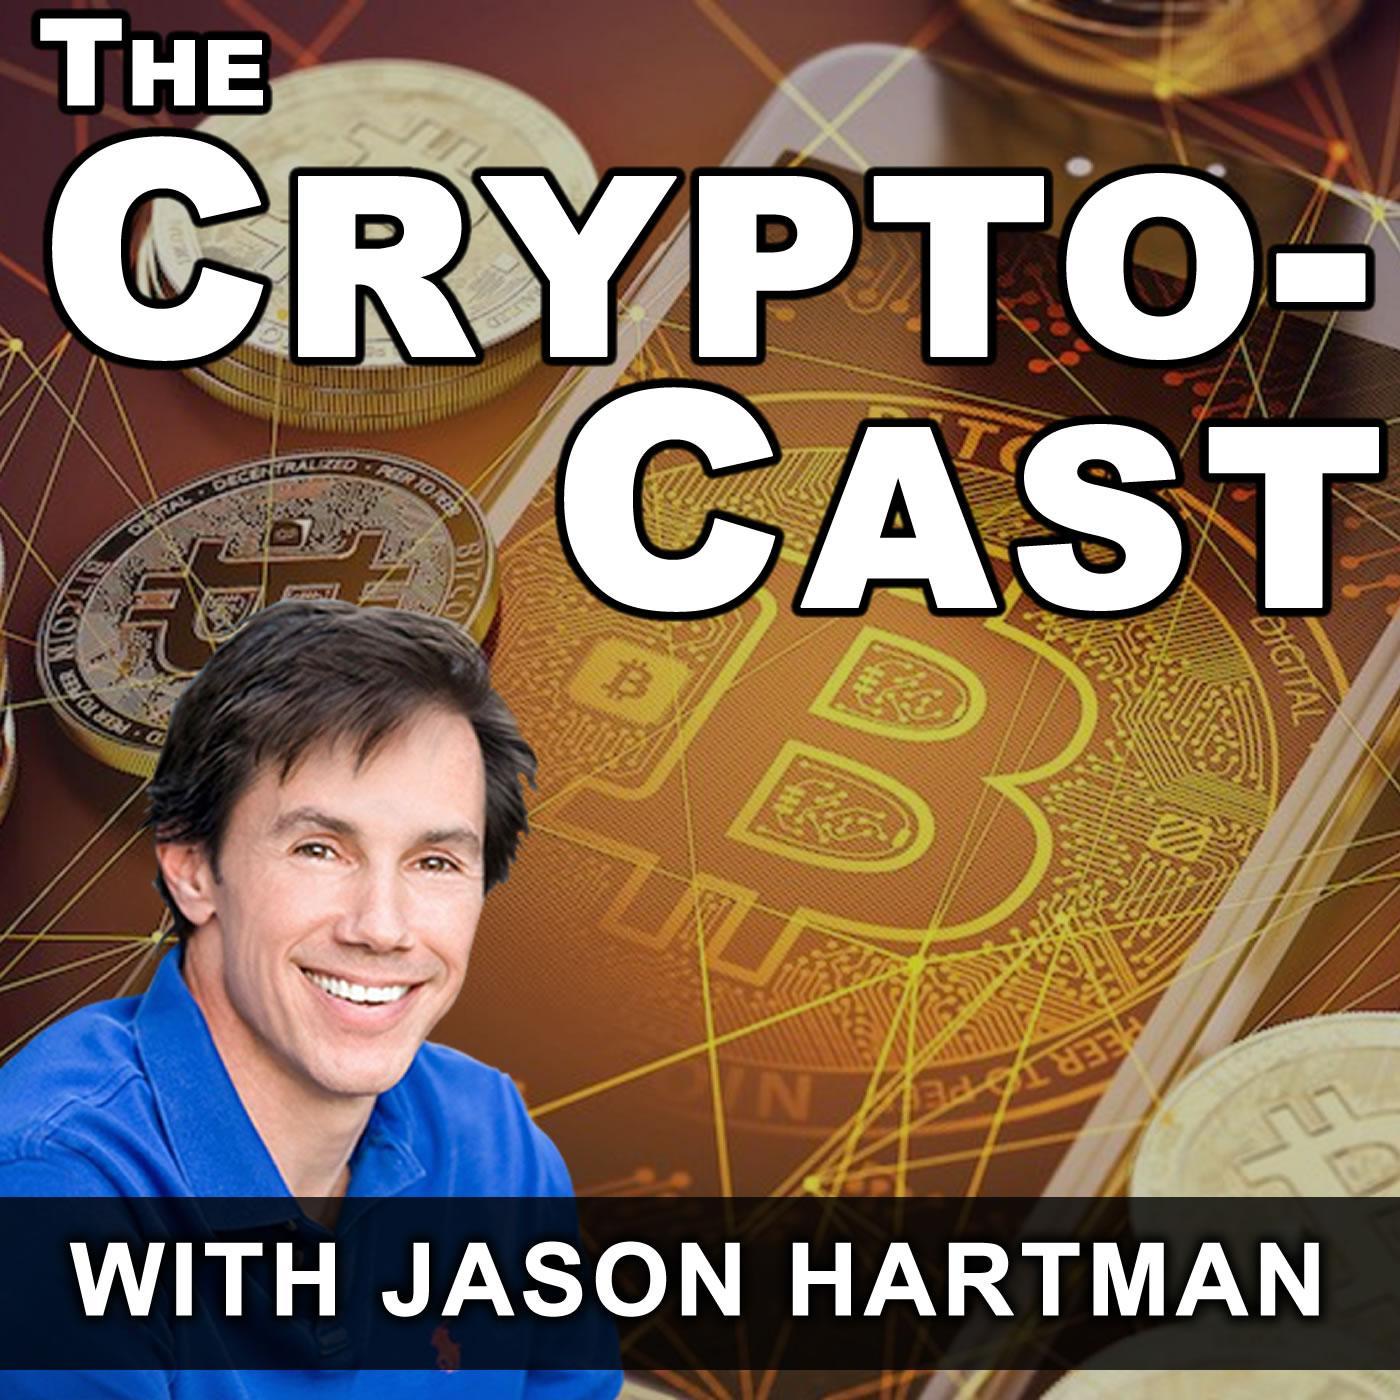 The CryptoCast with Jason Hartman show art